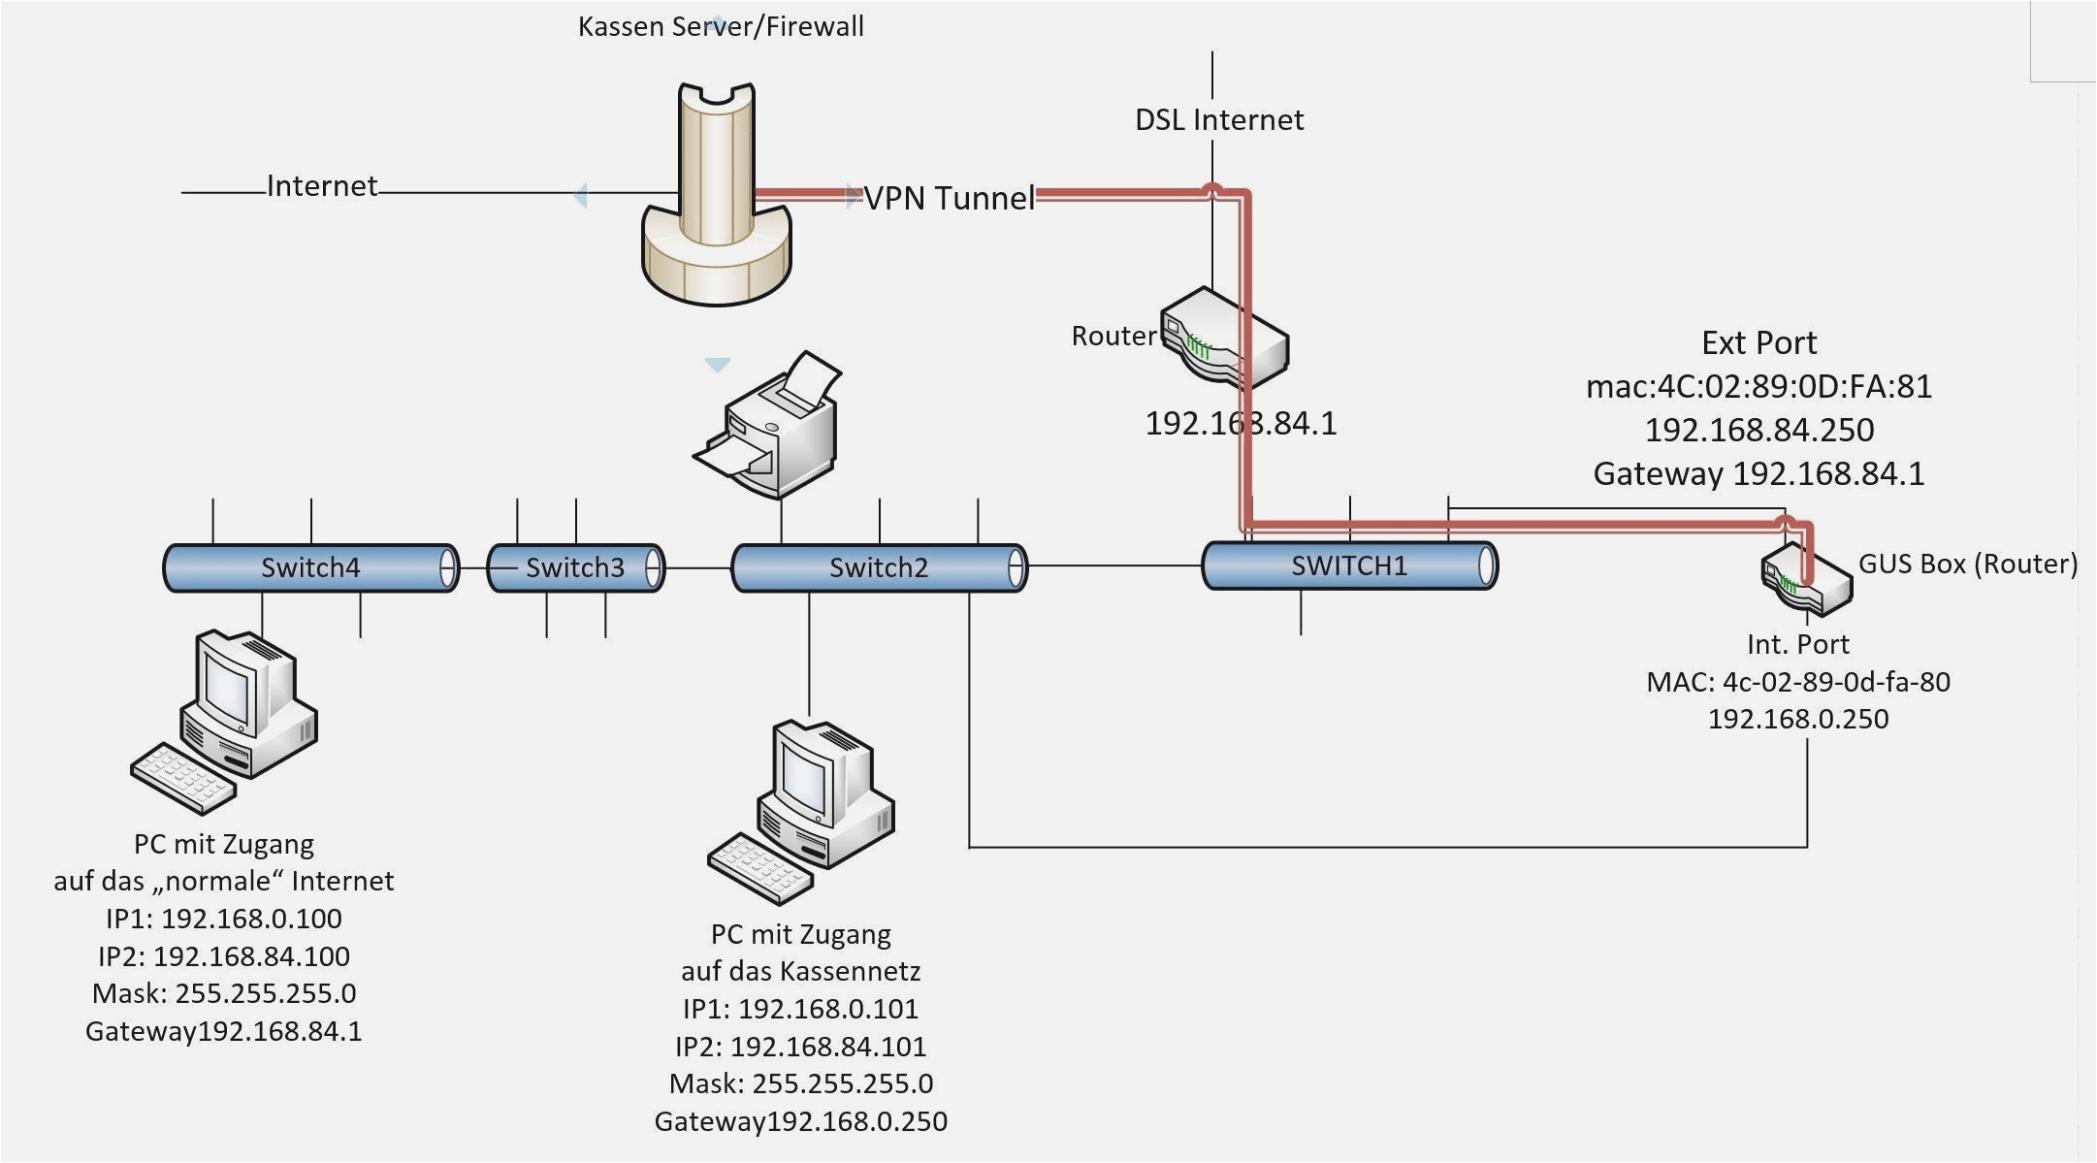 Ceiling Fan Diagram Wiring Wiring A Light Fixture Diagram Wiring Diagram Database